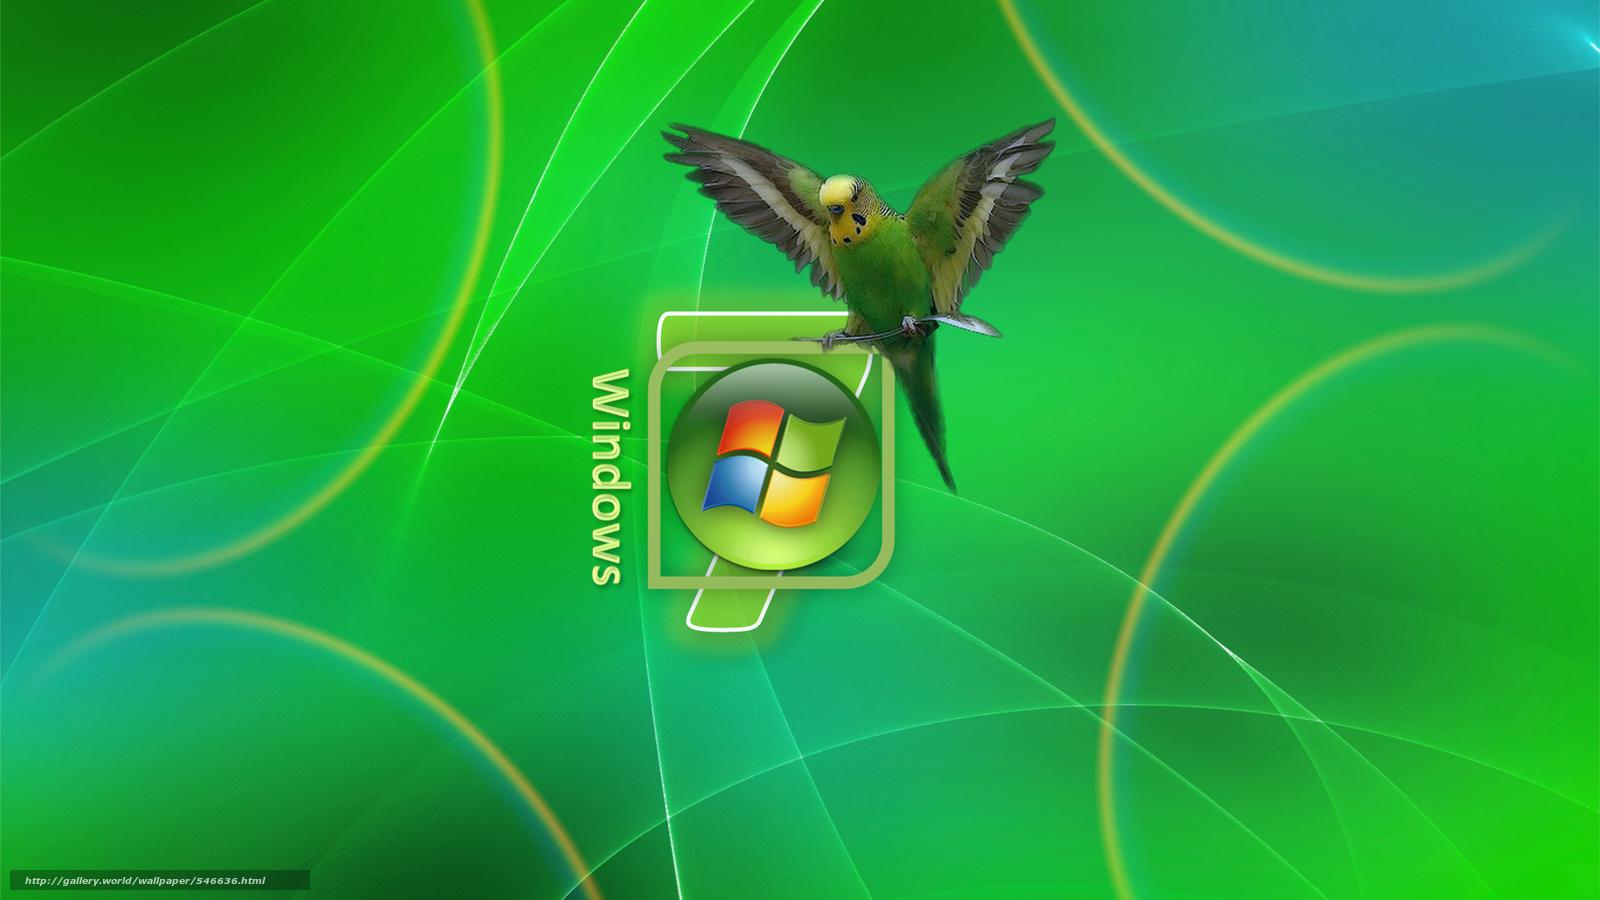 abstract desktop wallpaper 1920x1080